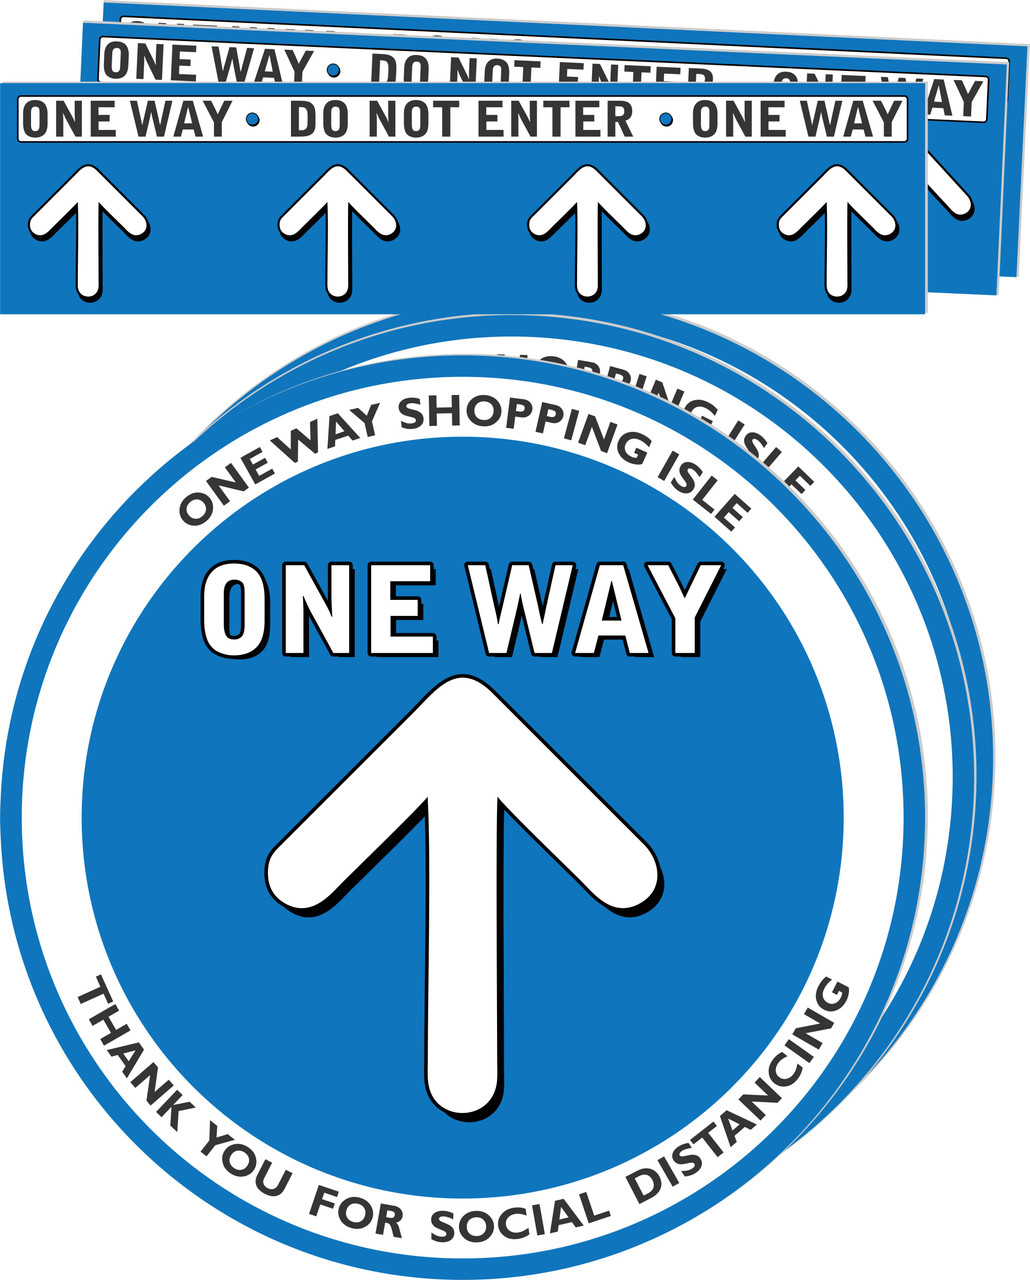 One way Aisle Social Distancing Floor Decal | Covid-19 Floor Sticker | Coronavirus Floor Decal | Social Distancing Floor Sign | Pandemic Floor Sticker | Do Not Enter Floor Sticker 3 pack